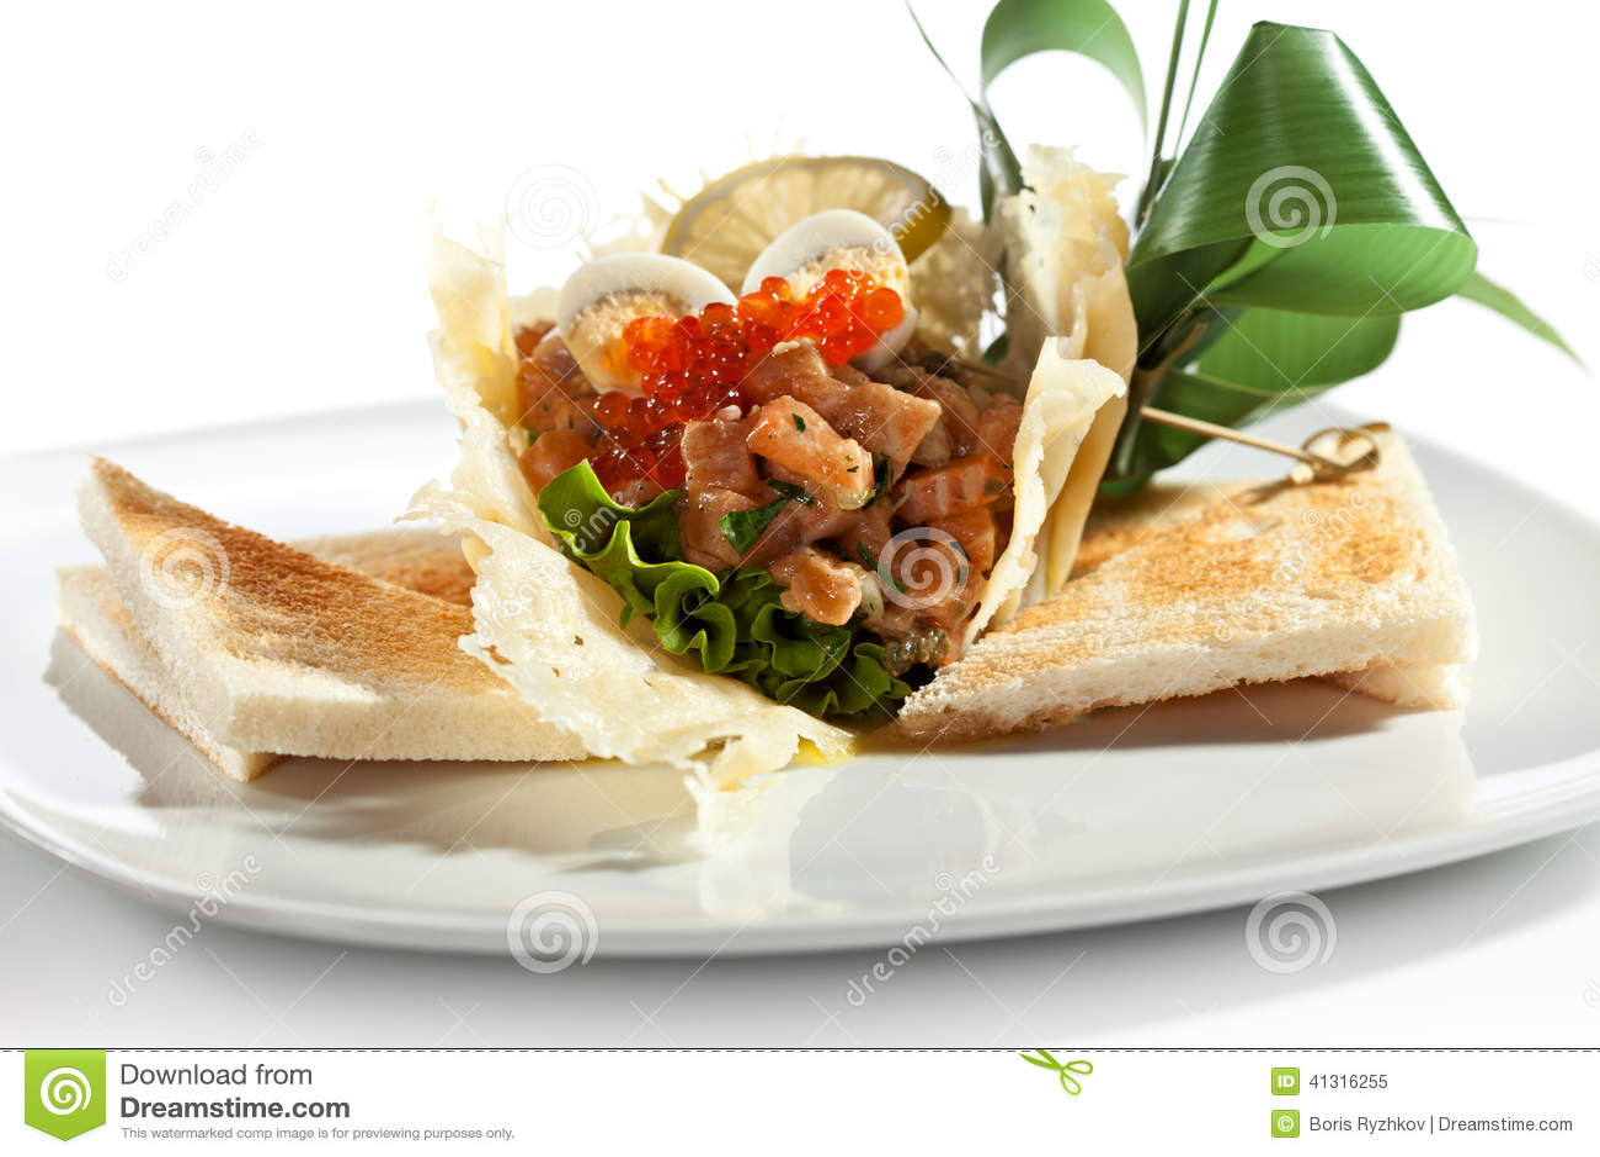 mango del sockeye salmon tartare salmon tartare with crispy bread